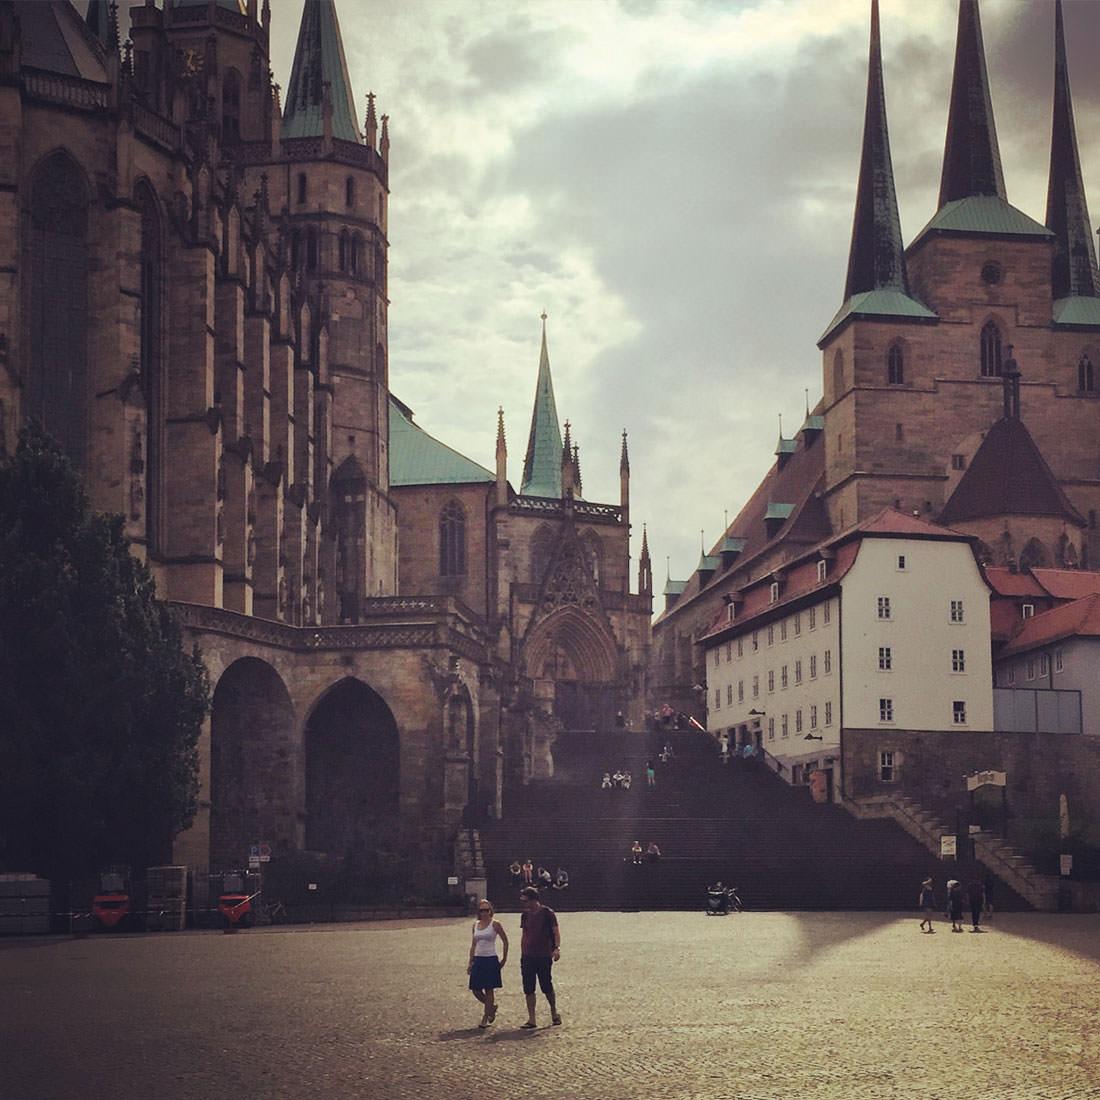 Stadtbummel in Erfurt